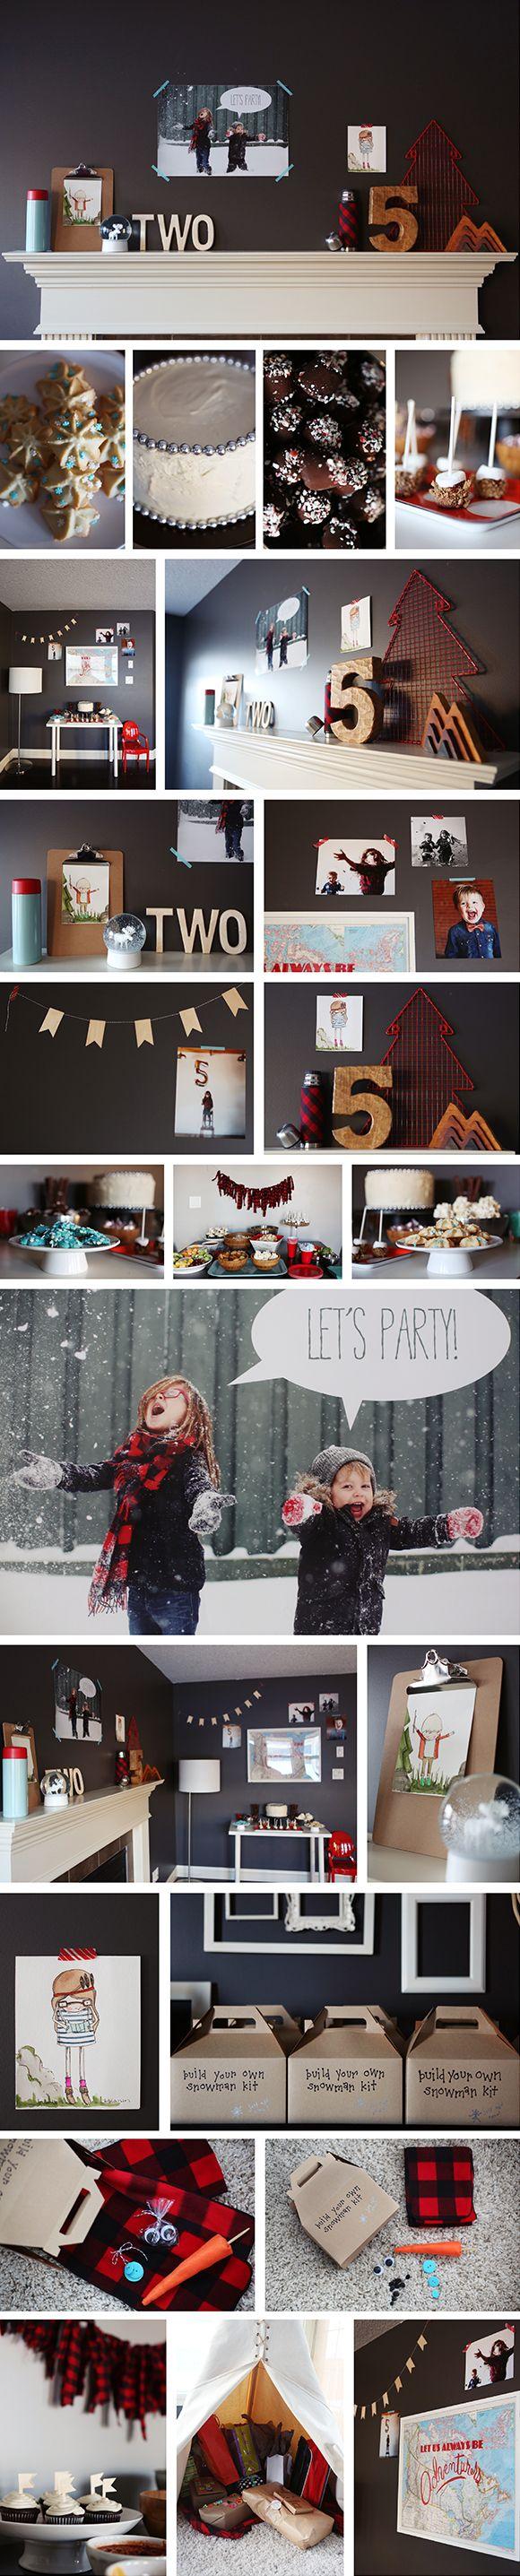 254 best Parties images on Pinterest | Kids party centerpieces ...